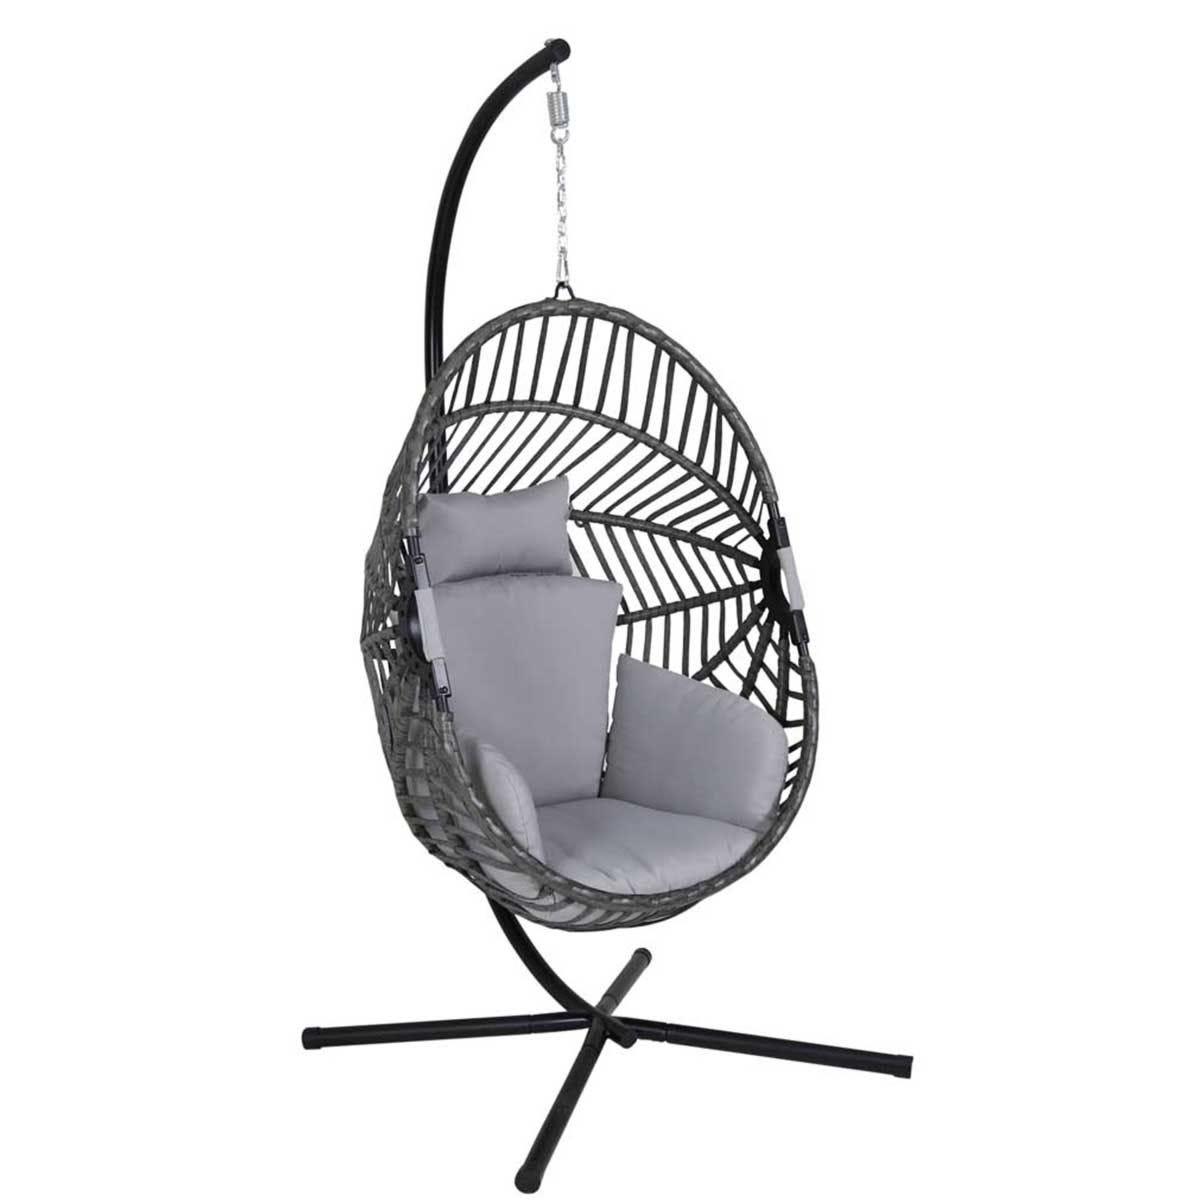 Charles Bentley Egg Shaped Swing Chair - Grey